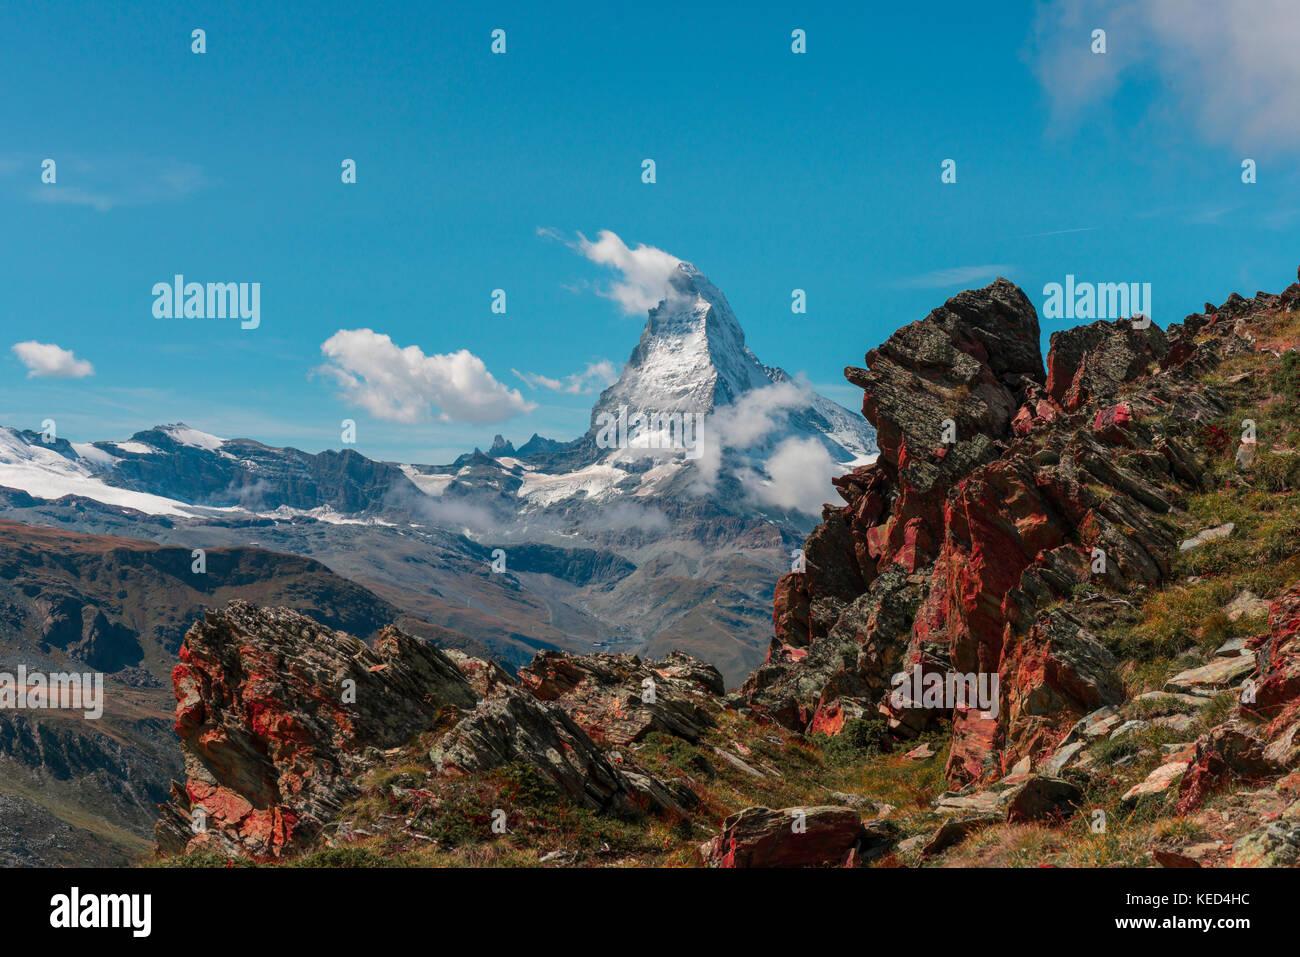 Snow-covered Matterhorn, reddish rock, view of Zermatt, Valais, Switzerland - Stock Image